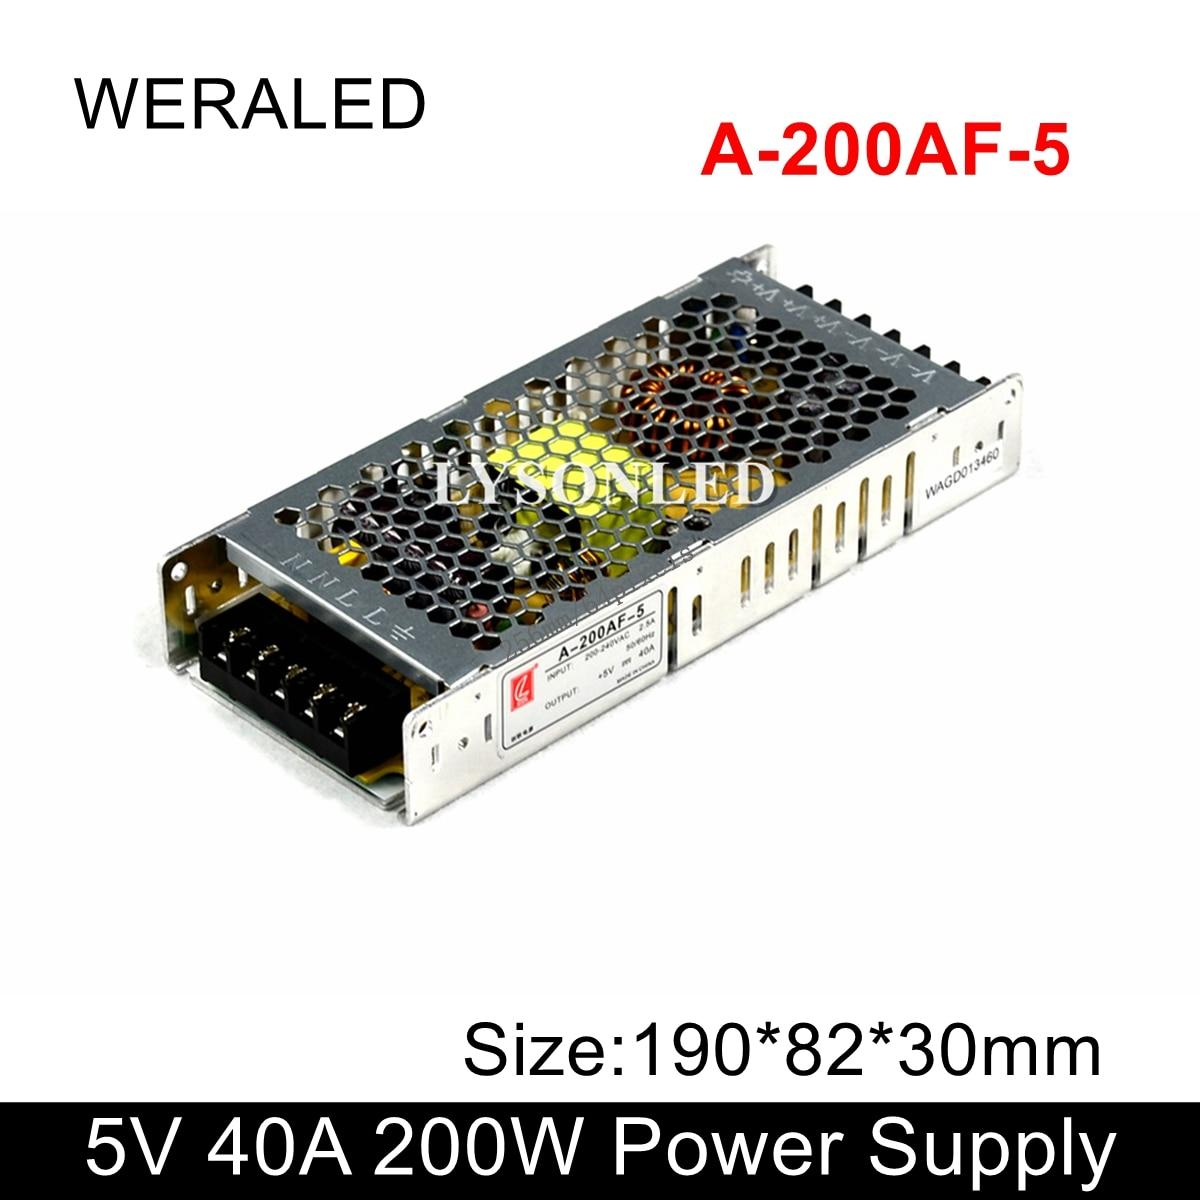 A-200AF-5 Chuanglian 5V 40A 200W Power Supply 110V 230V Input PSU For LED Display